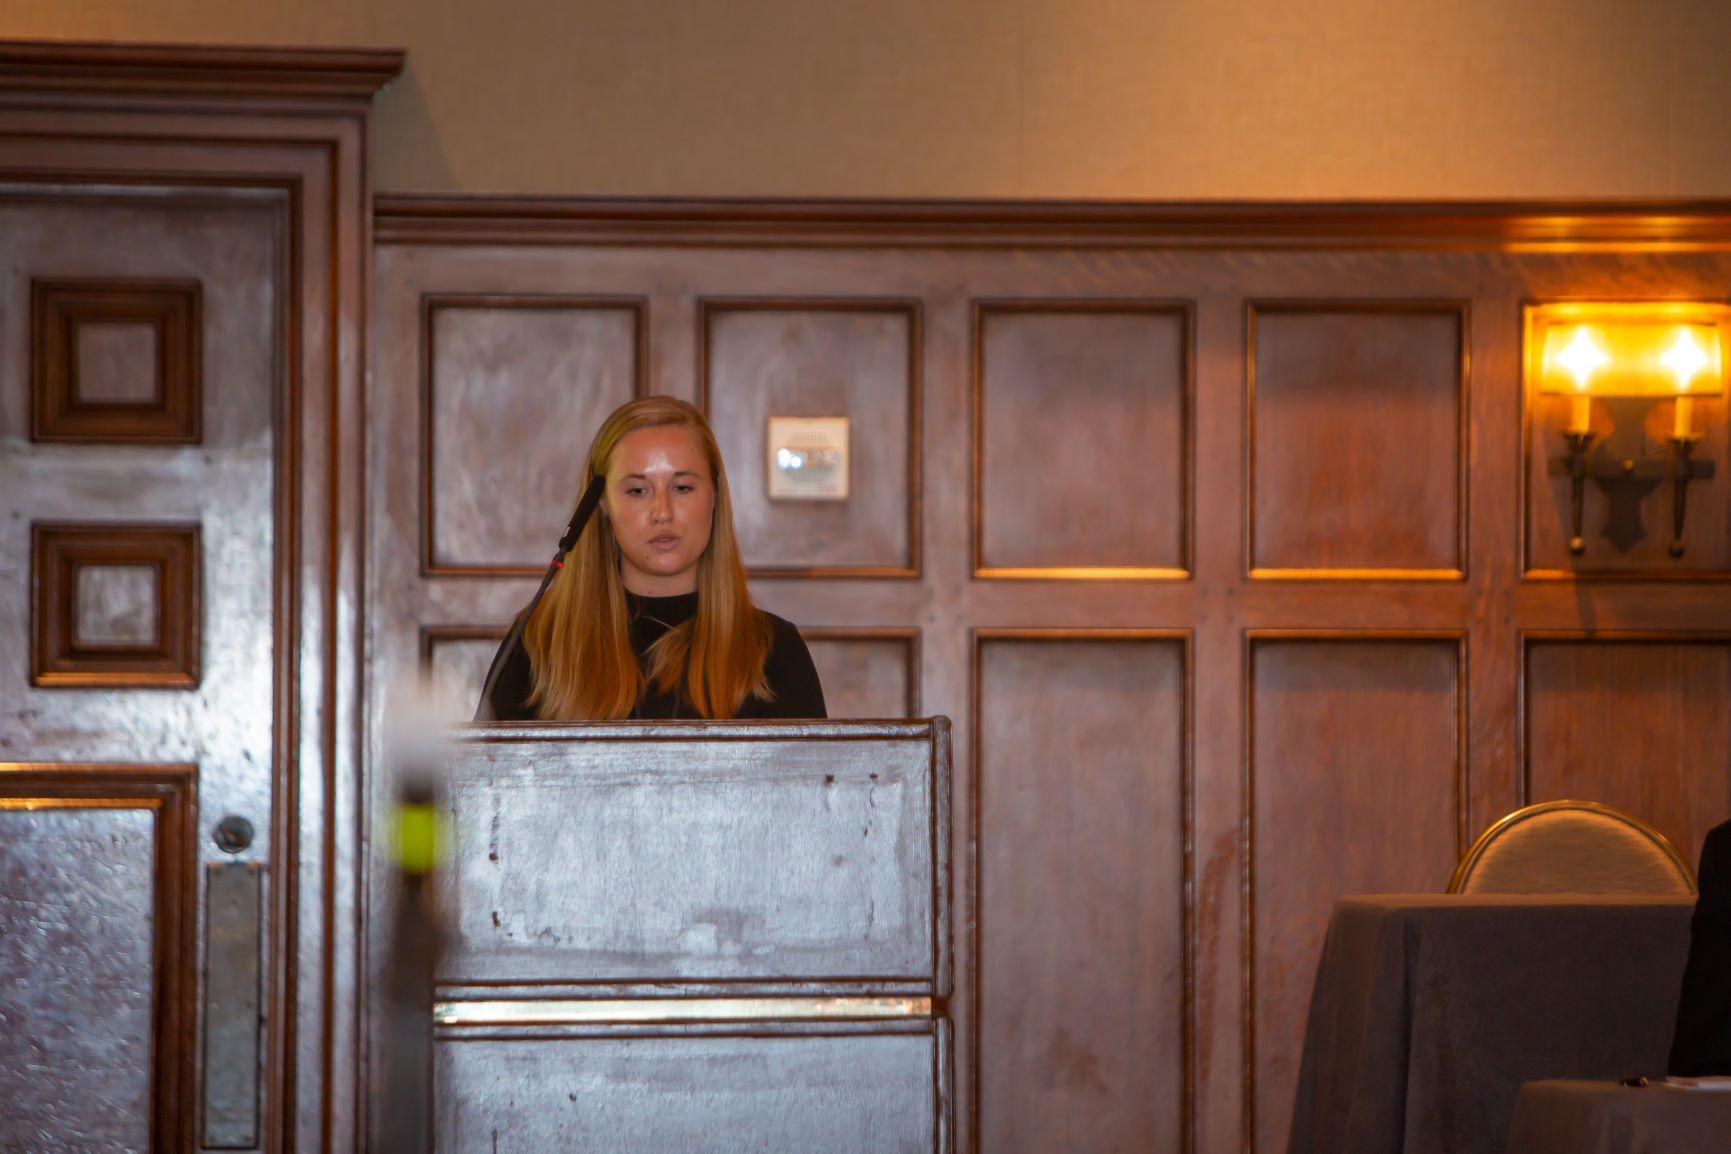 medical student at podium